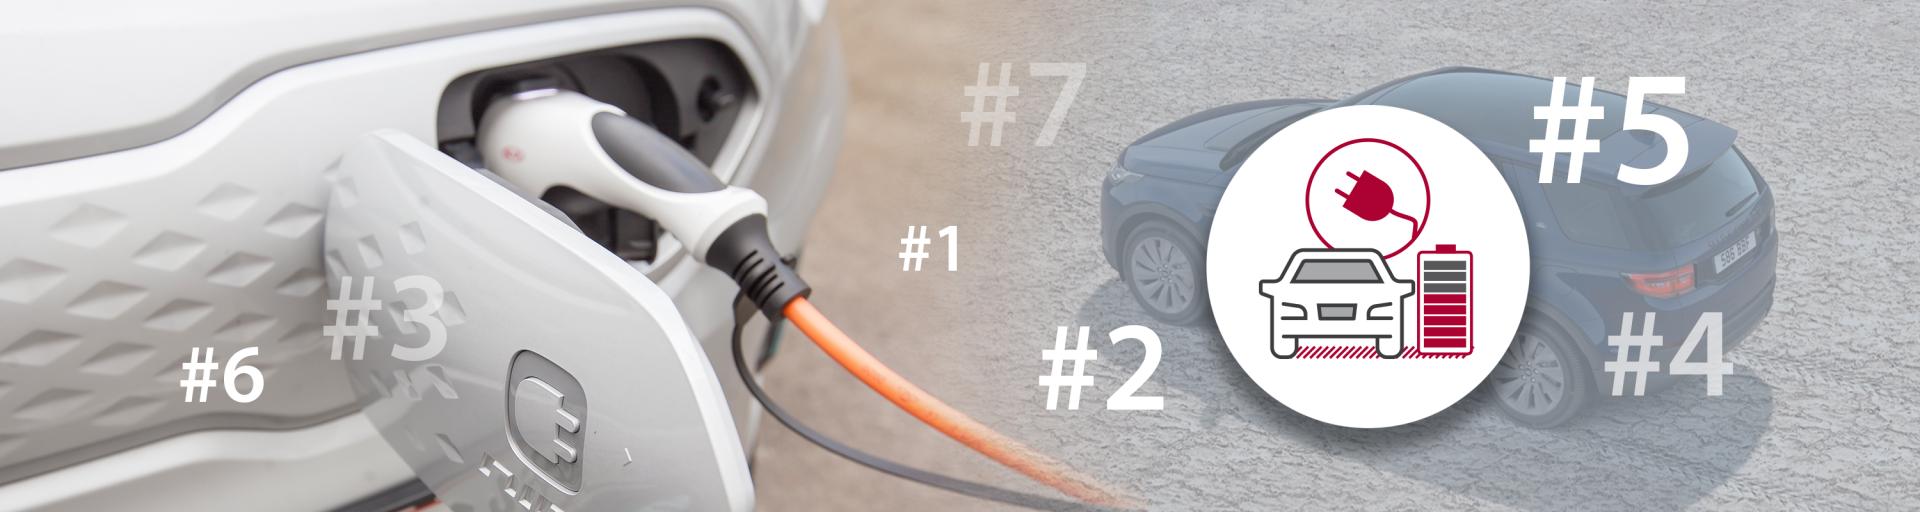 7 gute Gründe um elektrrisch zu fahren